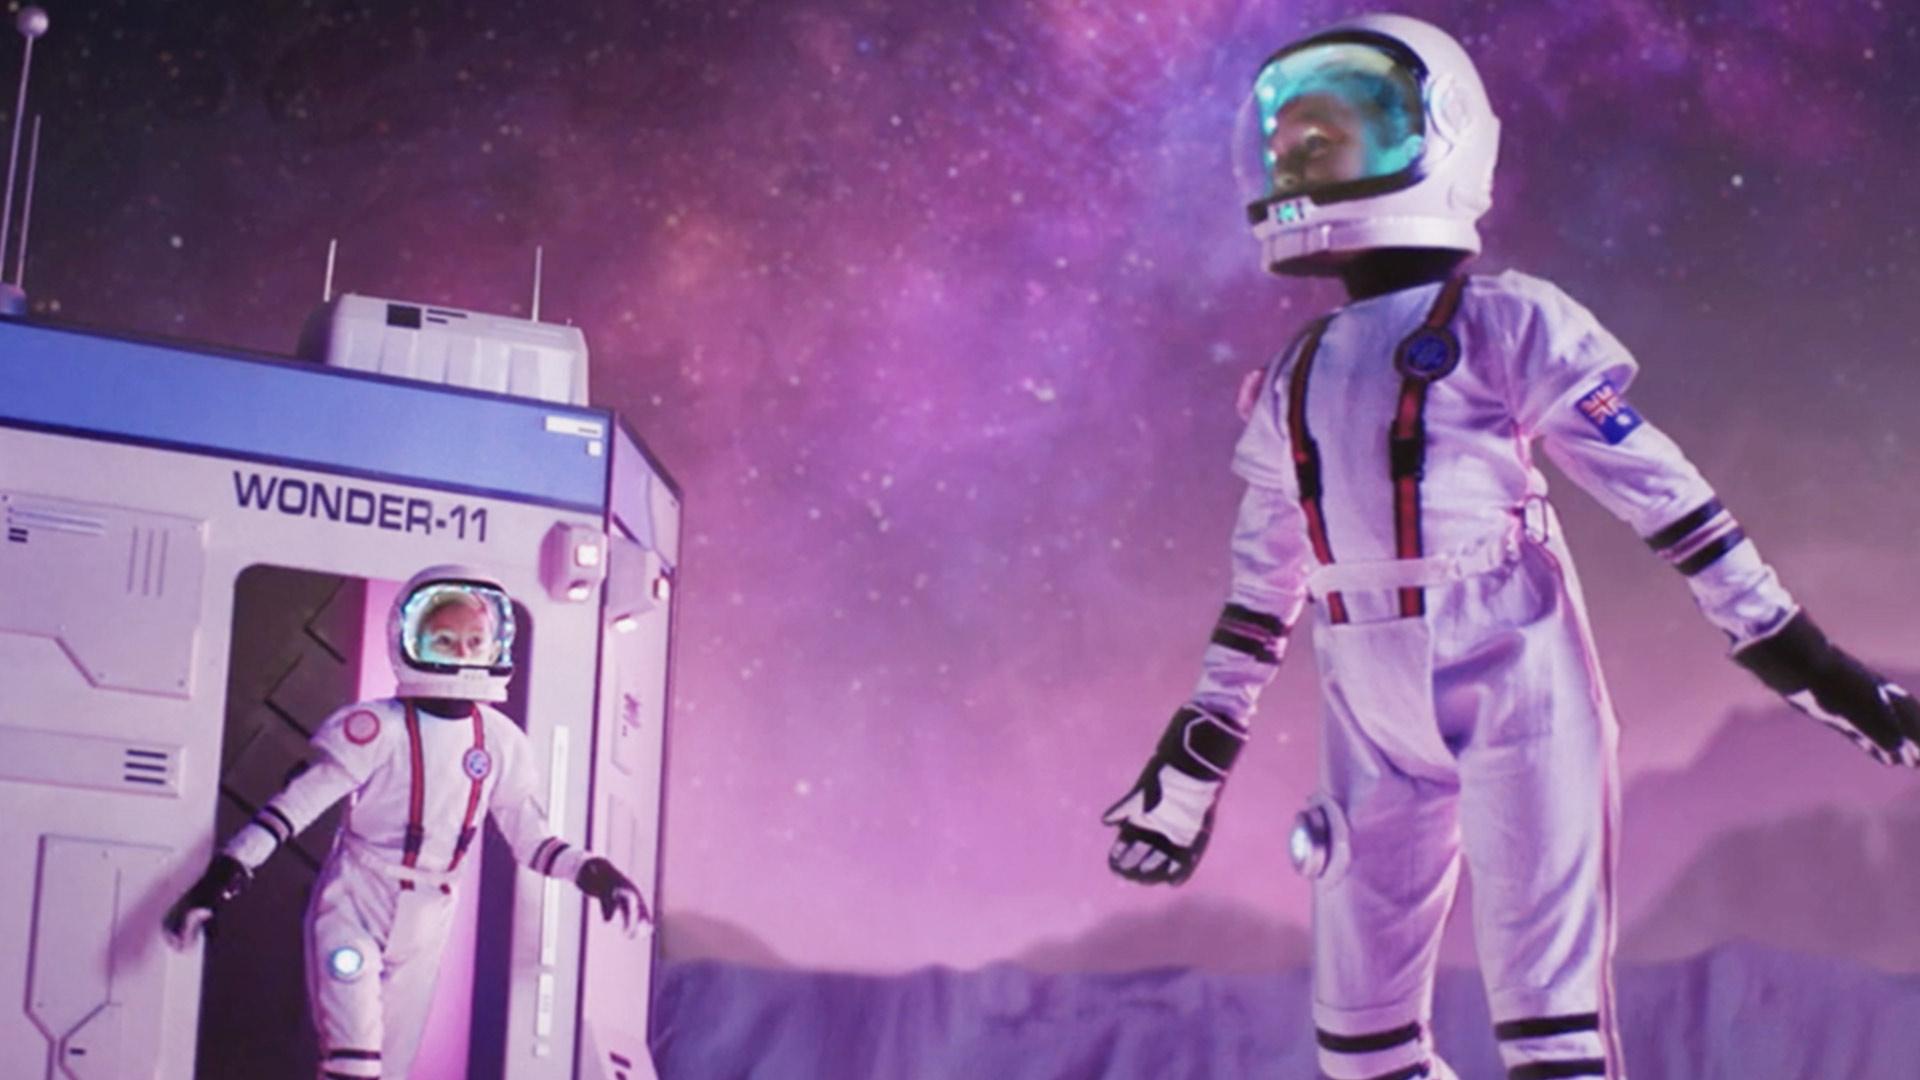 Wonder hero two children is space wearing space suits